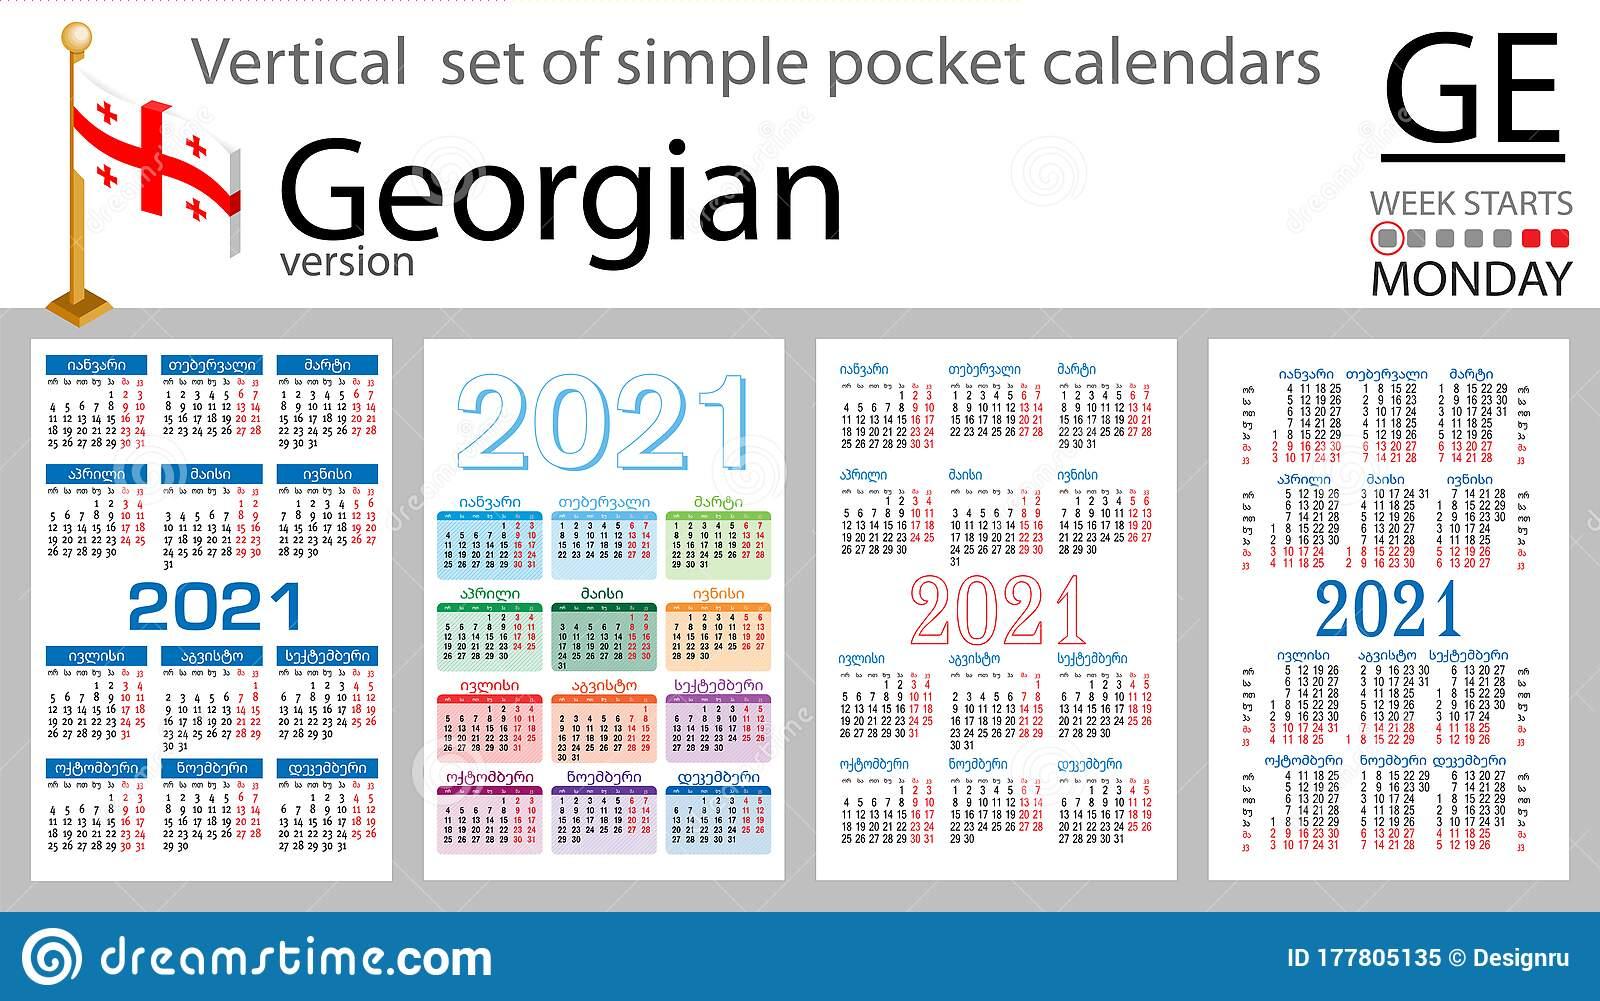 Georgian Vertical Pocket Calendar For 2021 Stock Vector regarding 2021-2021: Two-Year Monthly Pocket